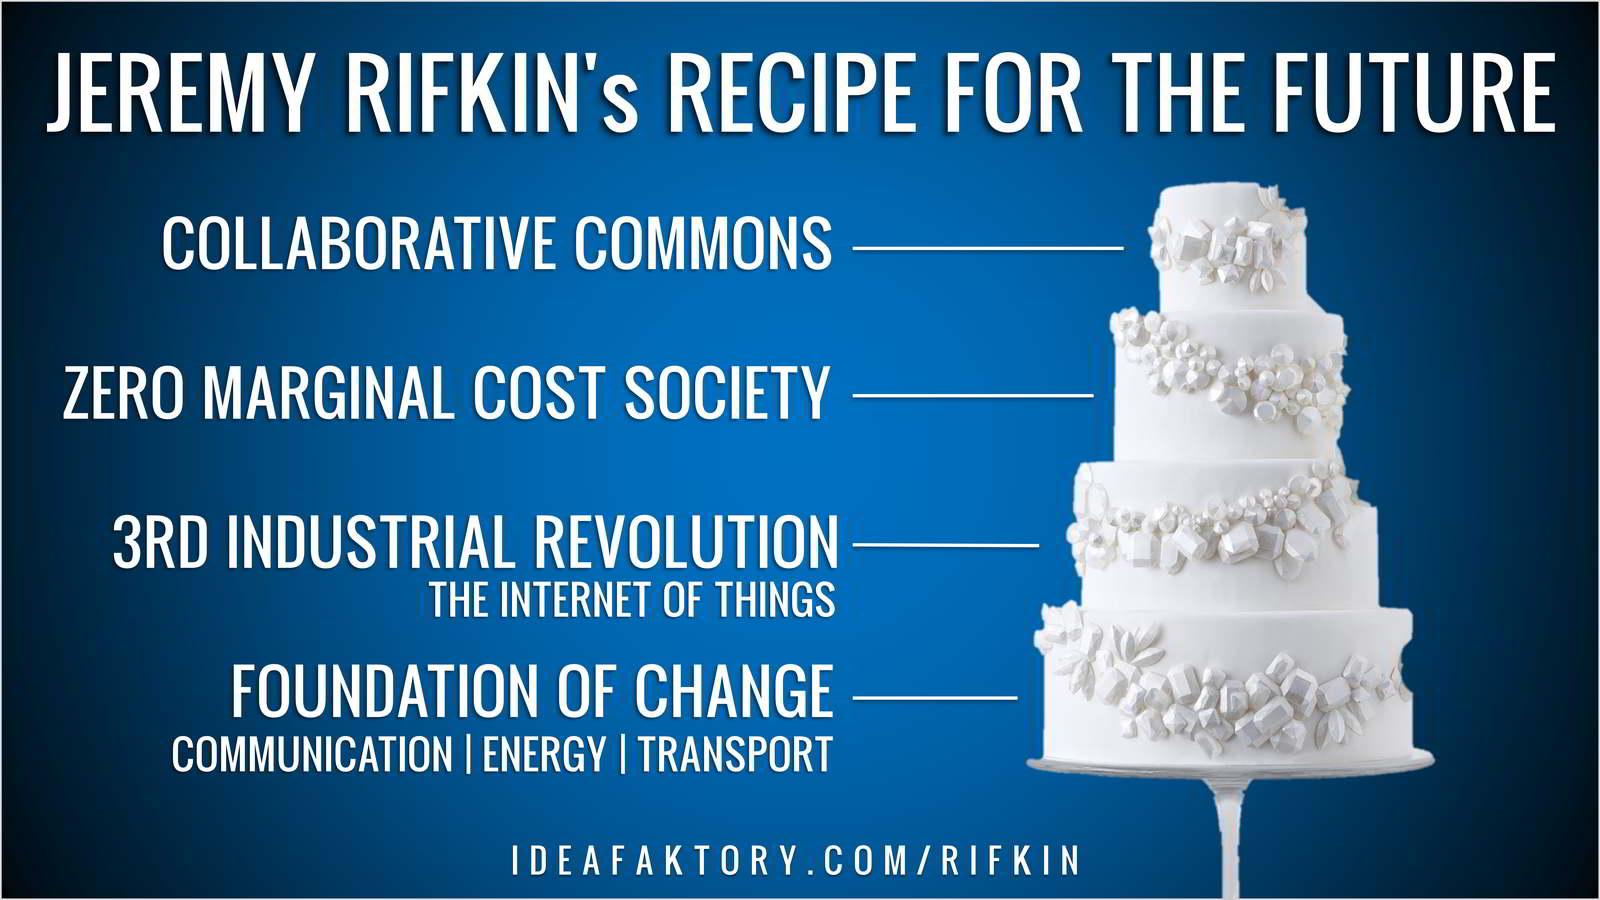 rifkin's image of the future.jpg